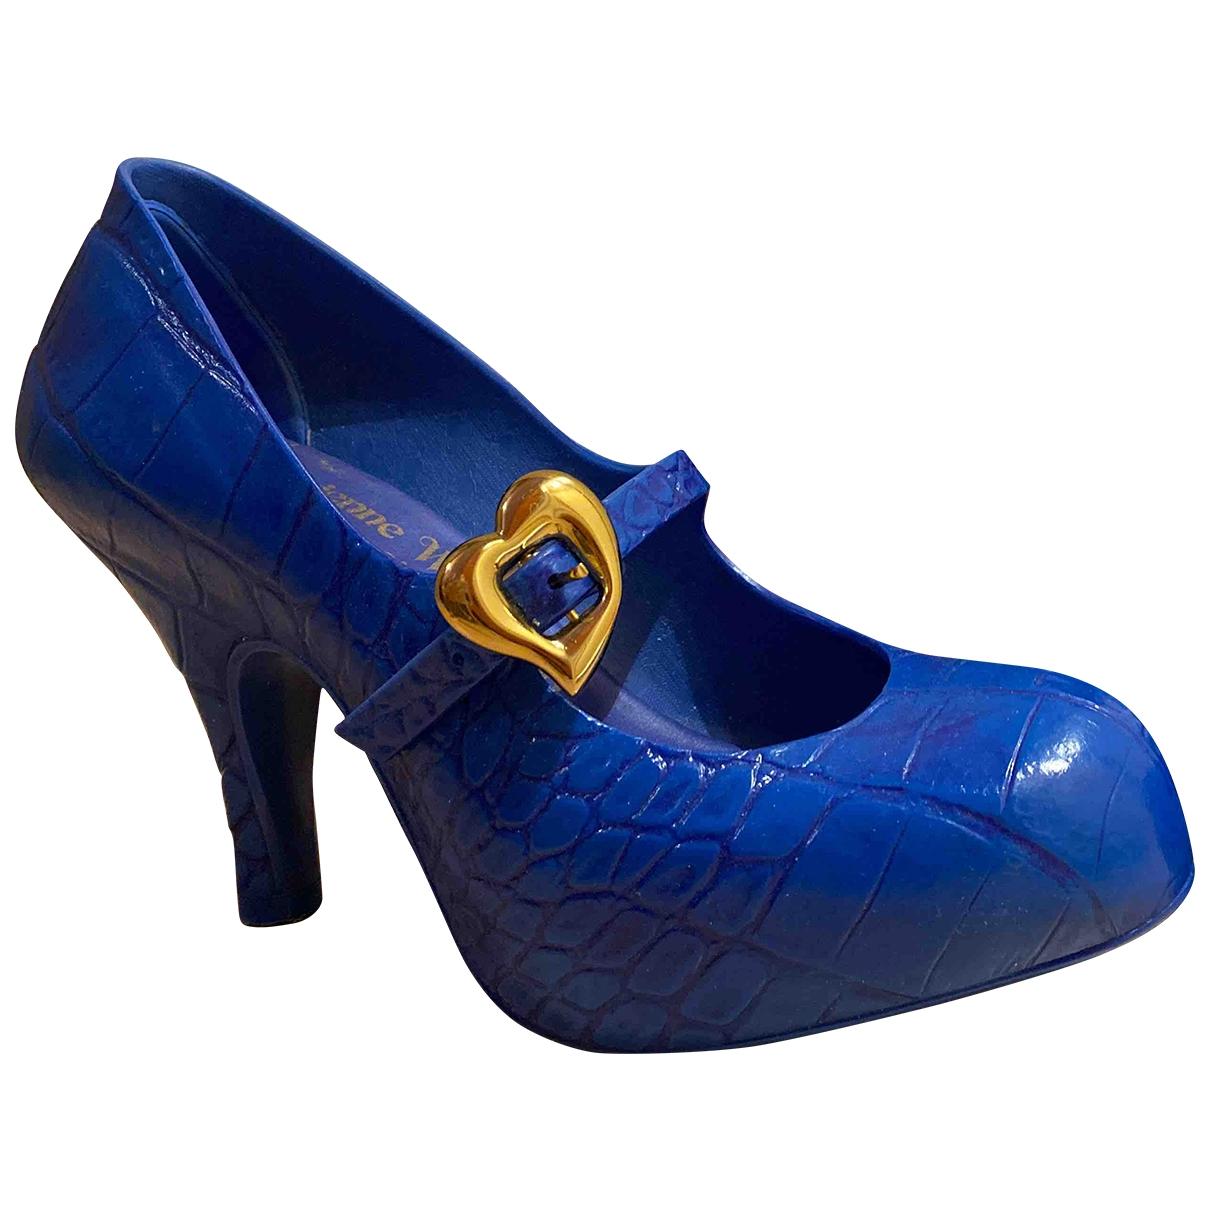 Vivienne Westwood Anglomania \N Clogs in  Blau Kautschuk